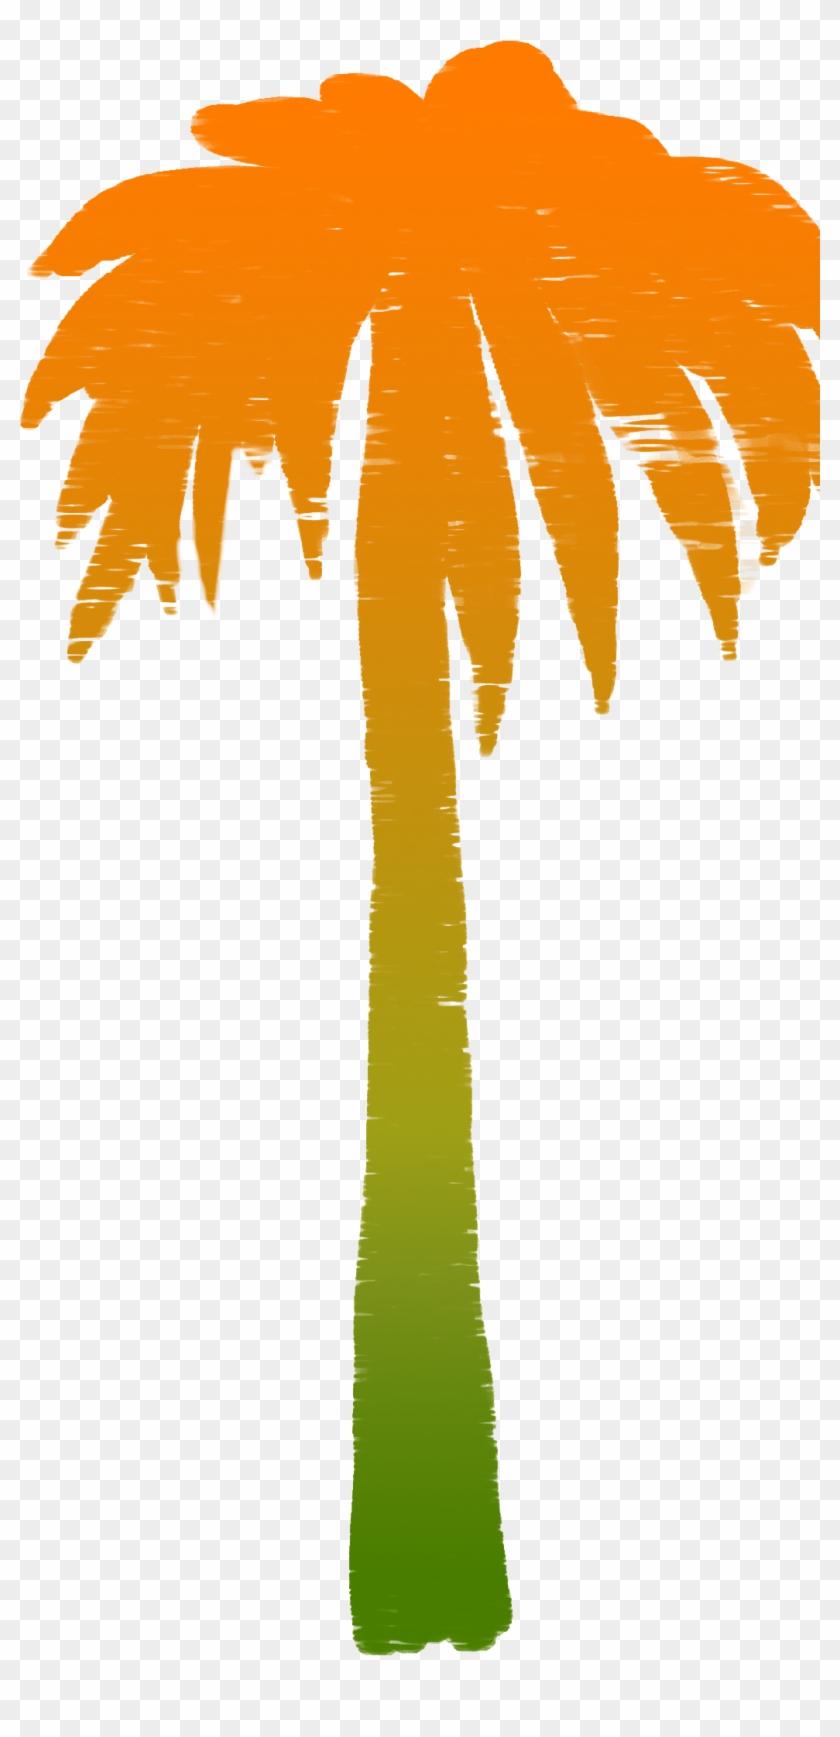 Tree Silhouette Clip Art - Tree Silhouette Clip Art #1533